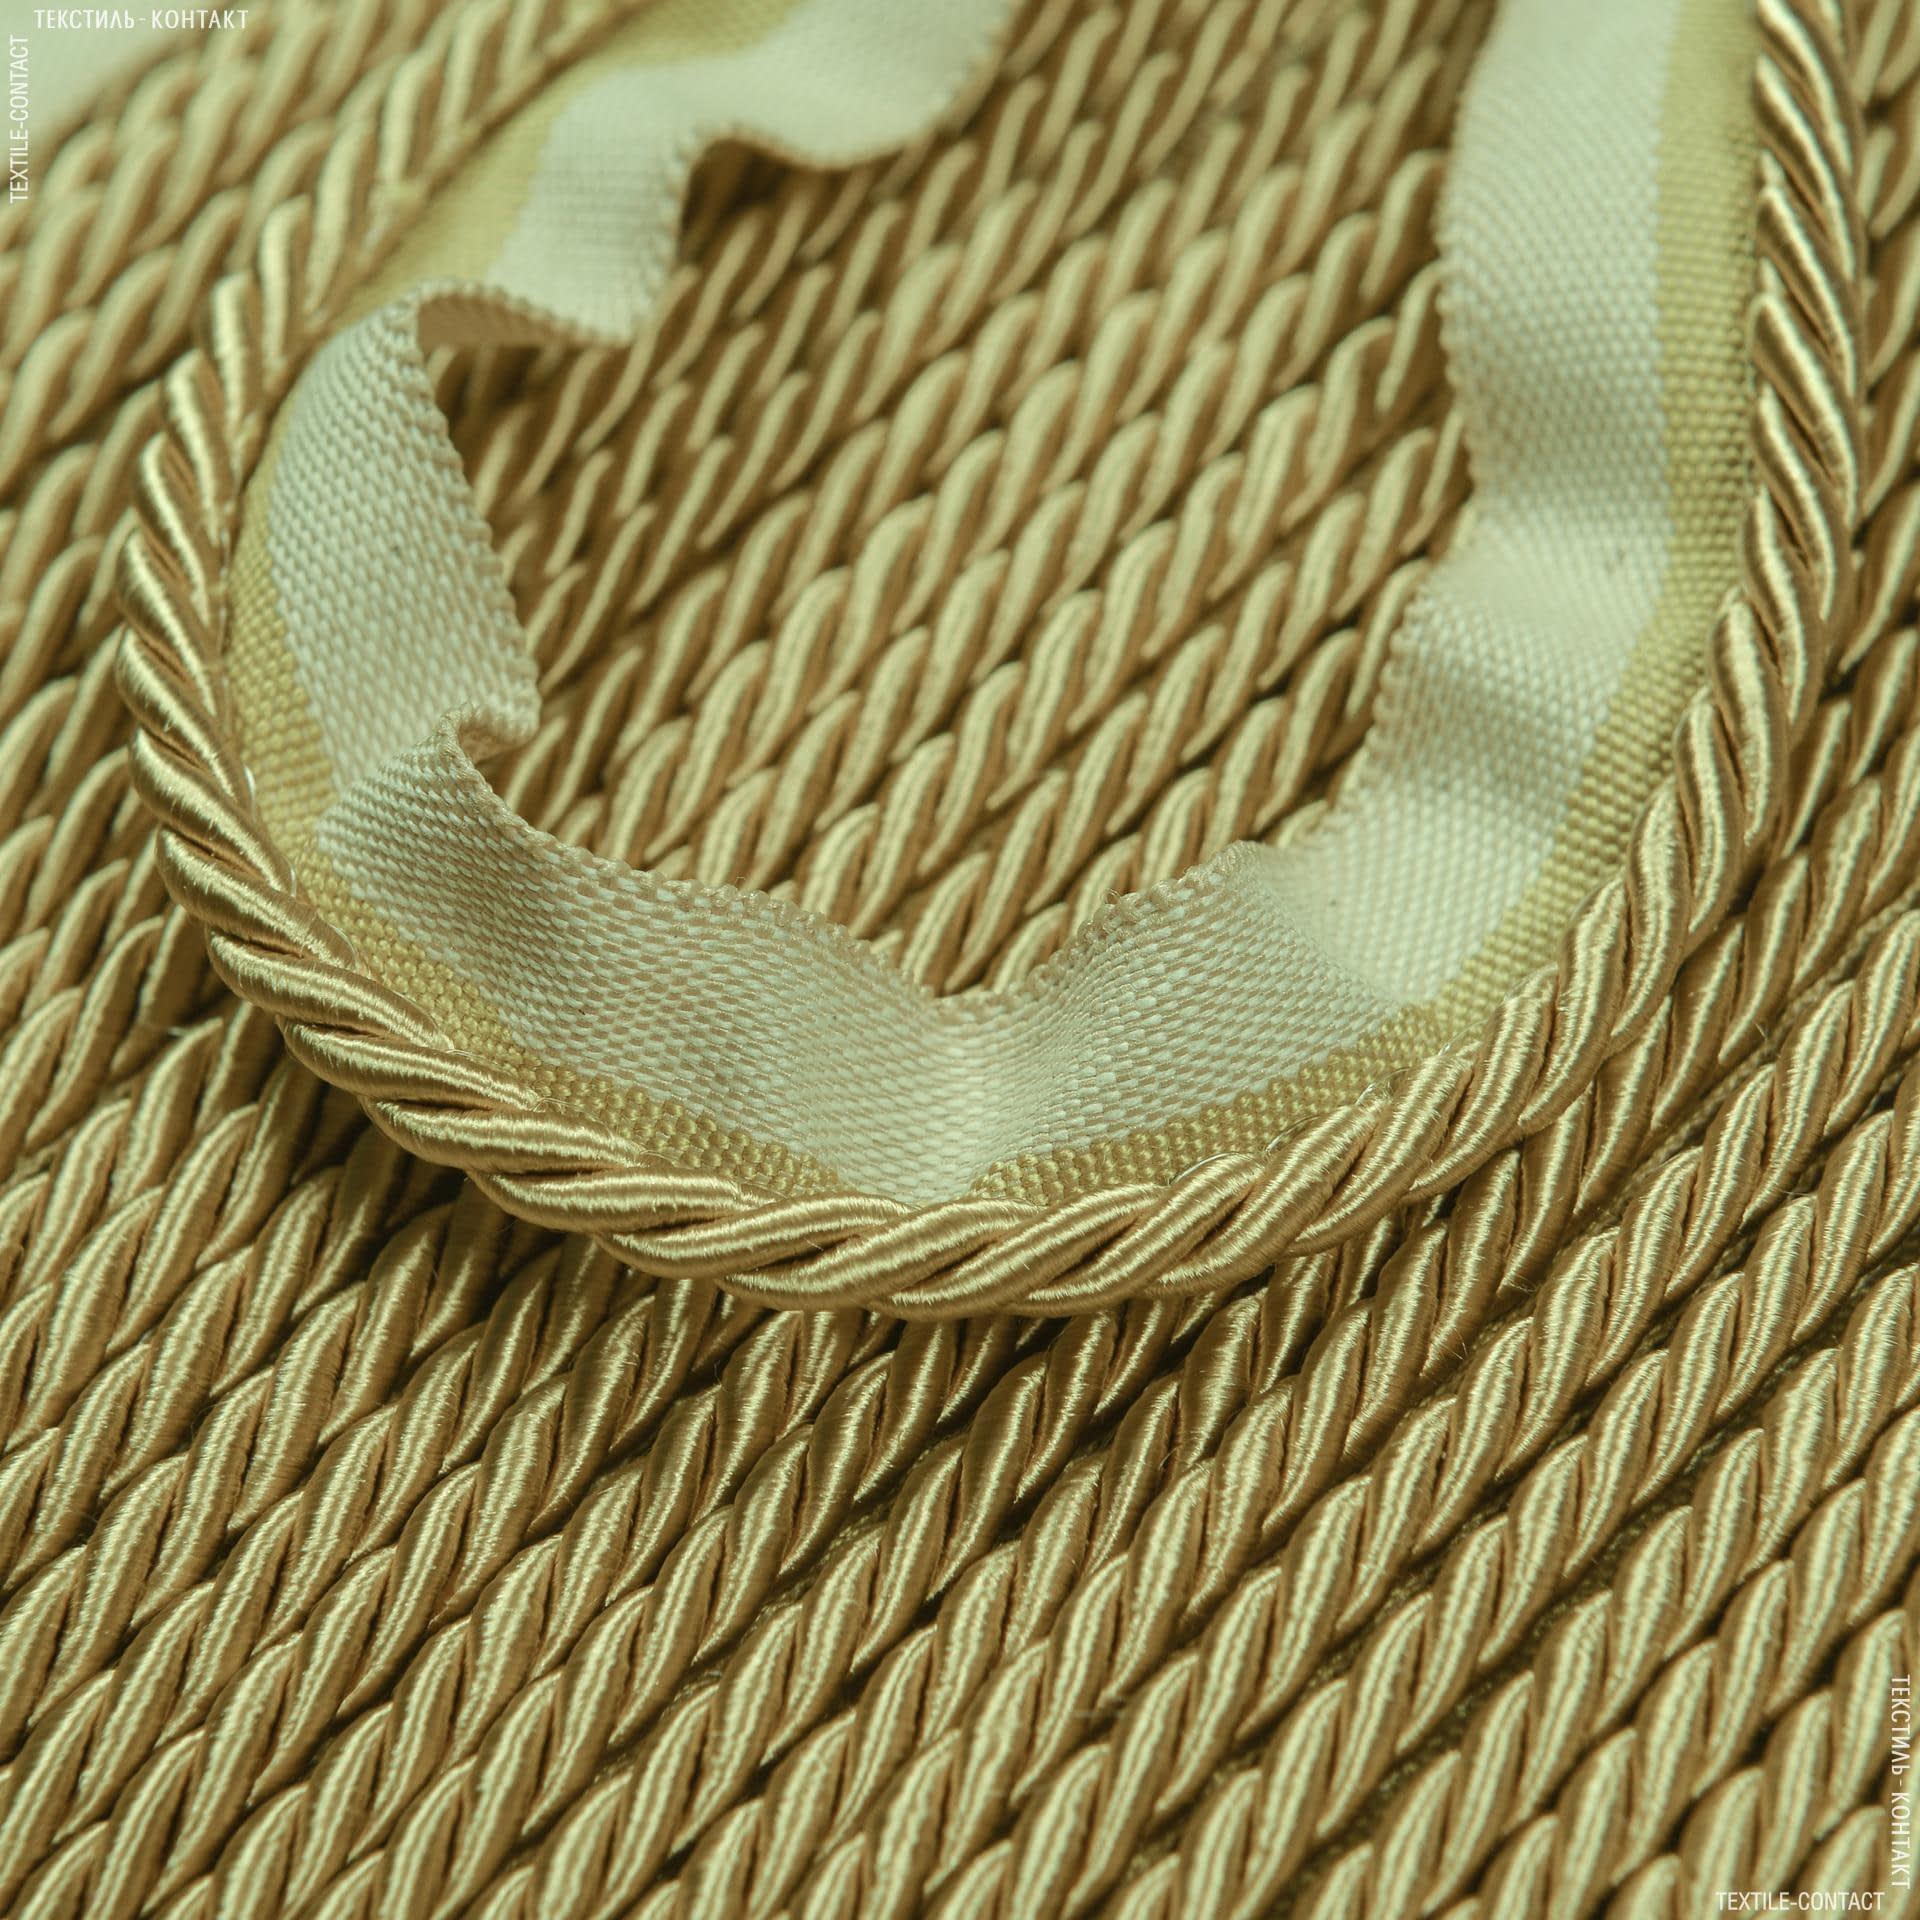 Ткани фурнитура для декора - ШНУР ОКАНТОВОЧНЫЙ ТОНЕНЬКИЙСОЛАР  Т.ЗОЛОТО  d=5мм